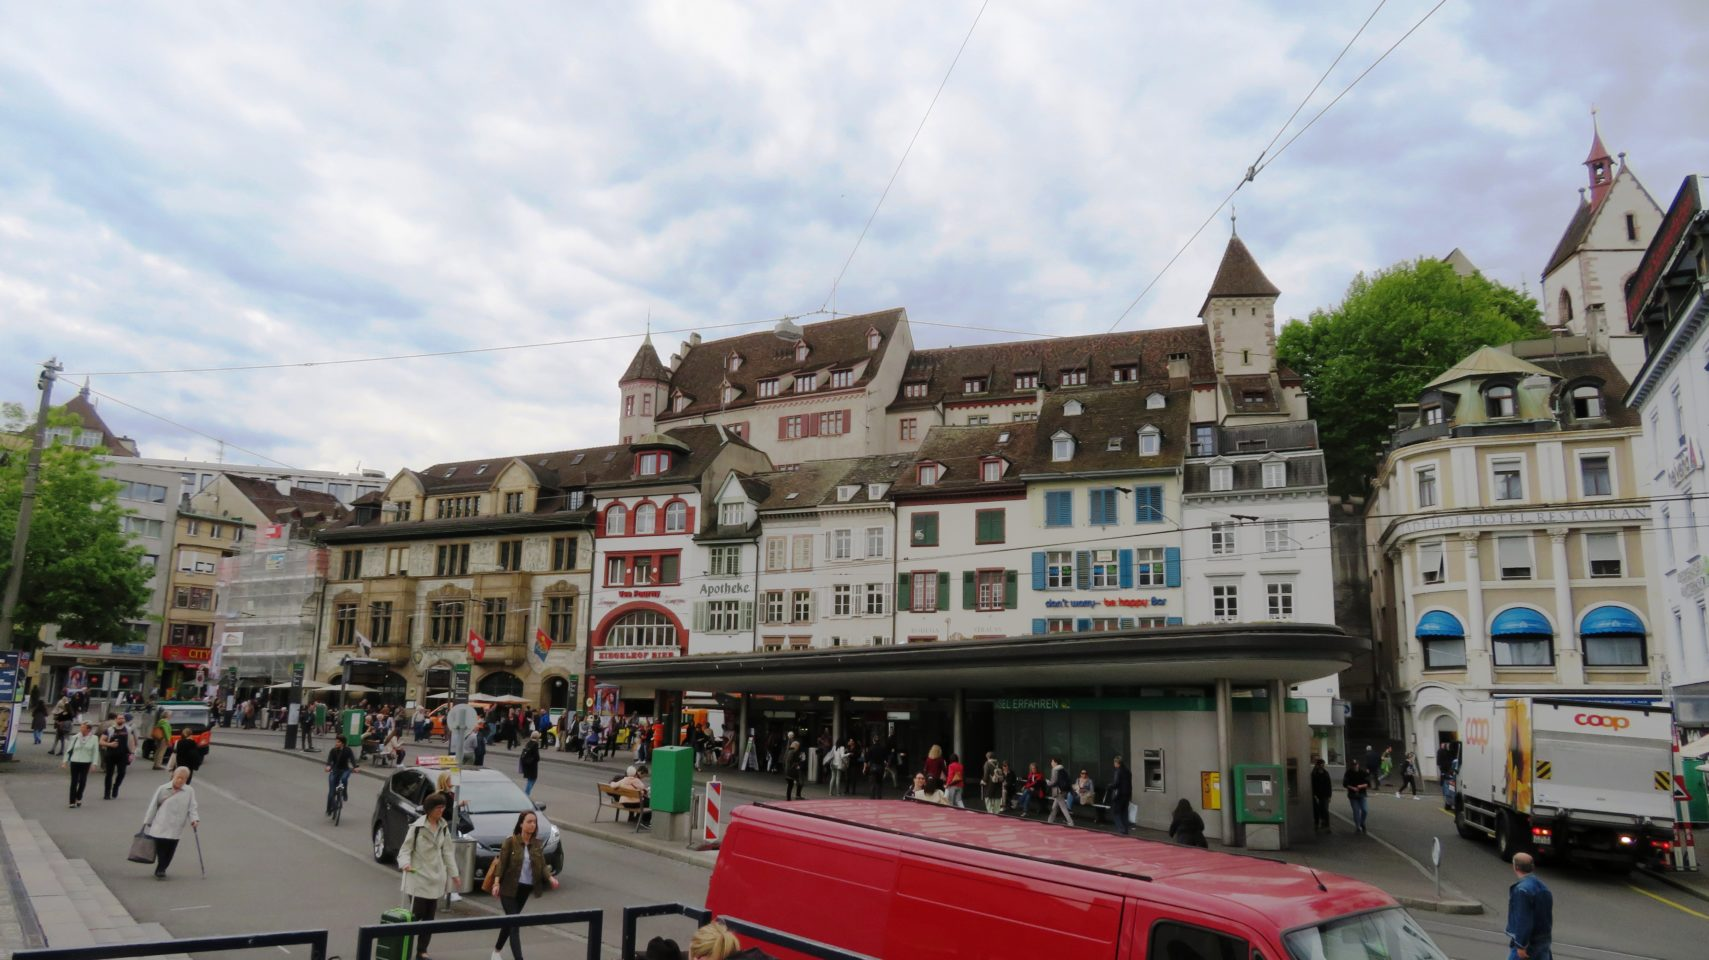 Busy historic BarfusserPlatz in <em><strong>Basel</strong></em>, Switzerland